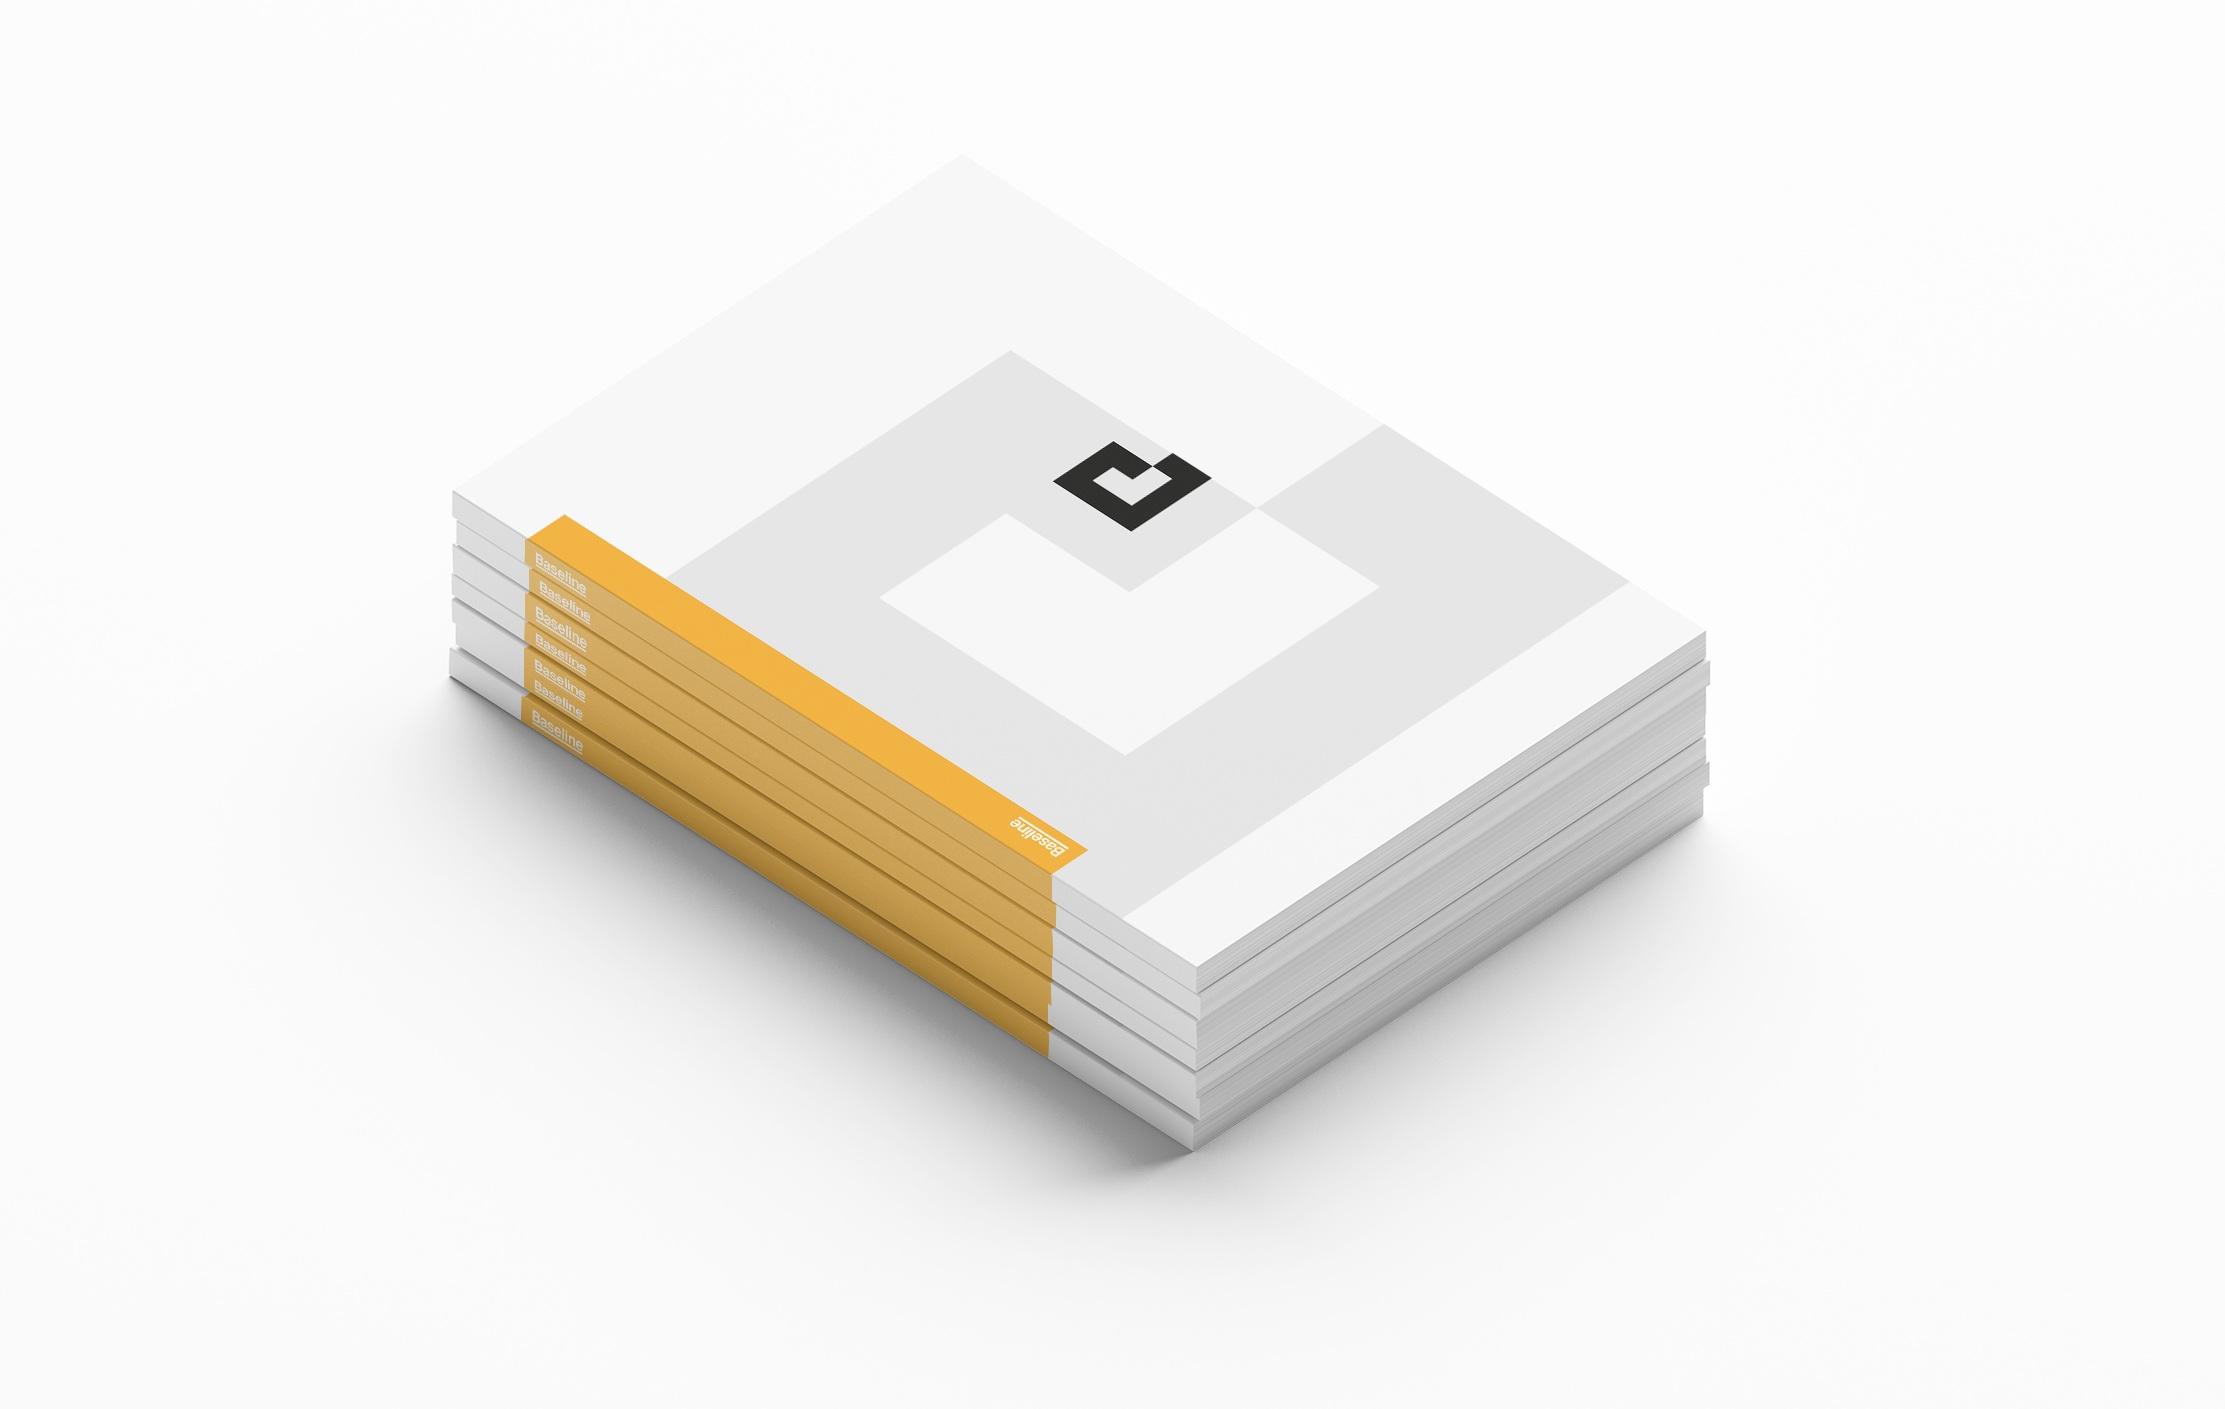 Baseline_magazine+stack_1_2500.jpg